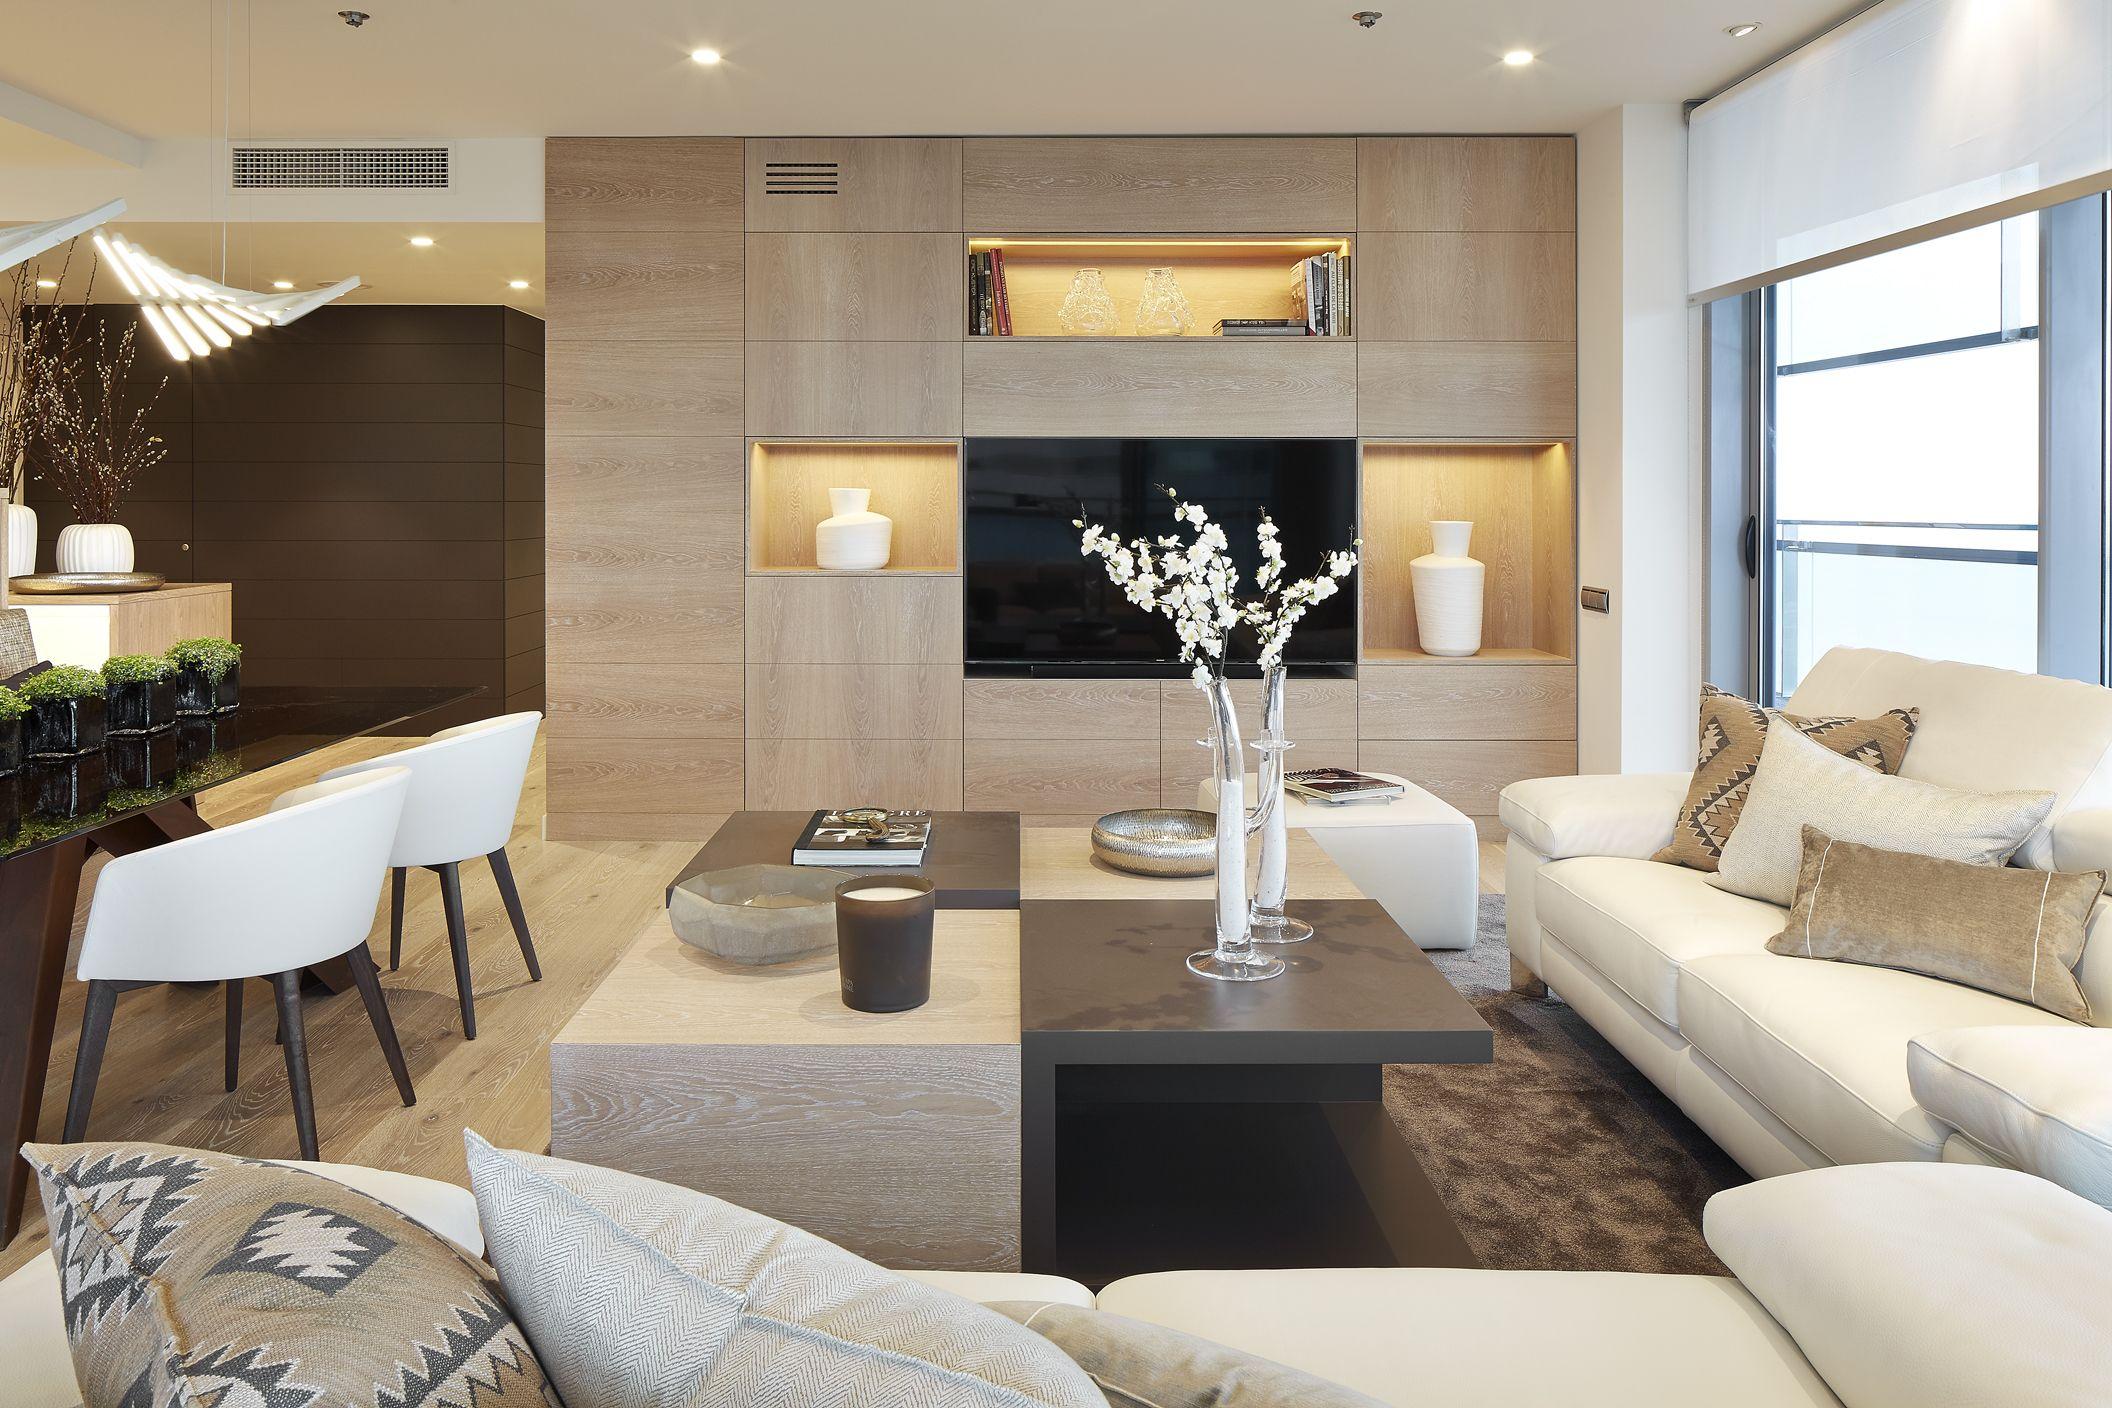 Molins Interiors // Arquitectura Interior   Interiorismo   Salón   Comedor    Mueble   Mesa